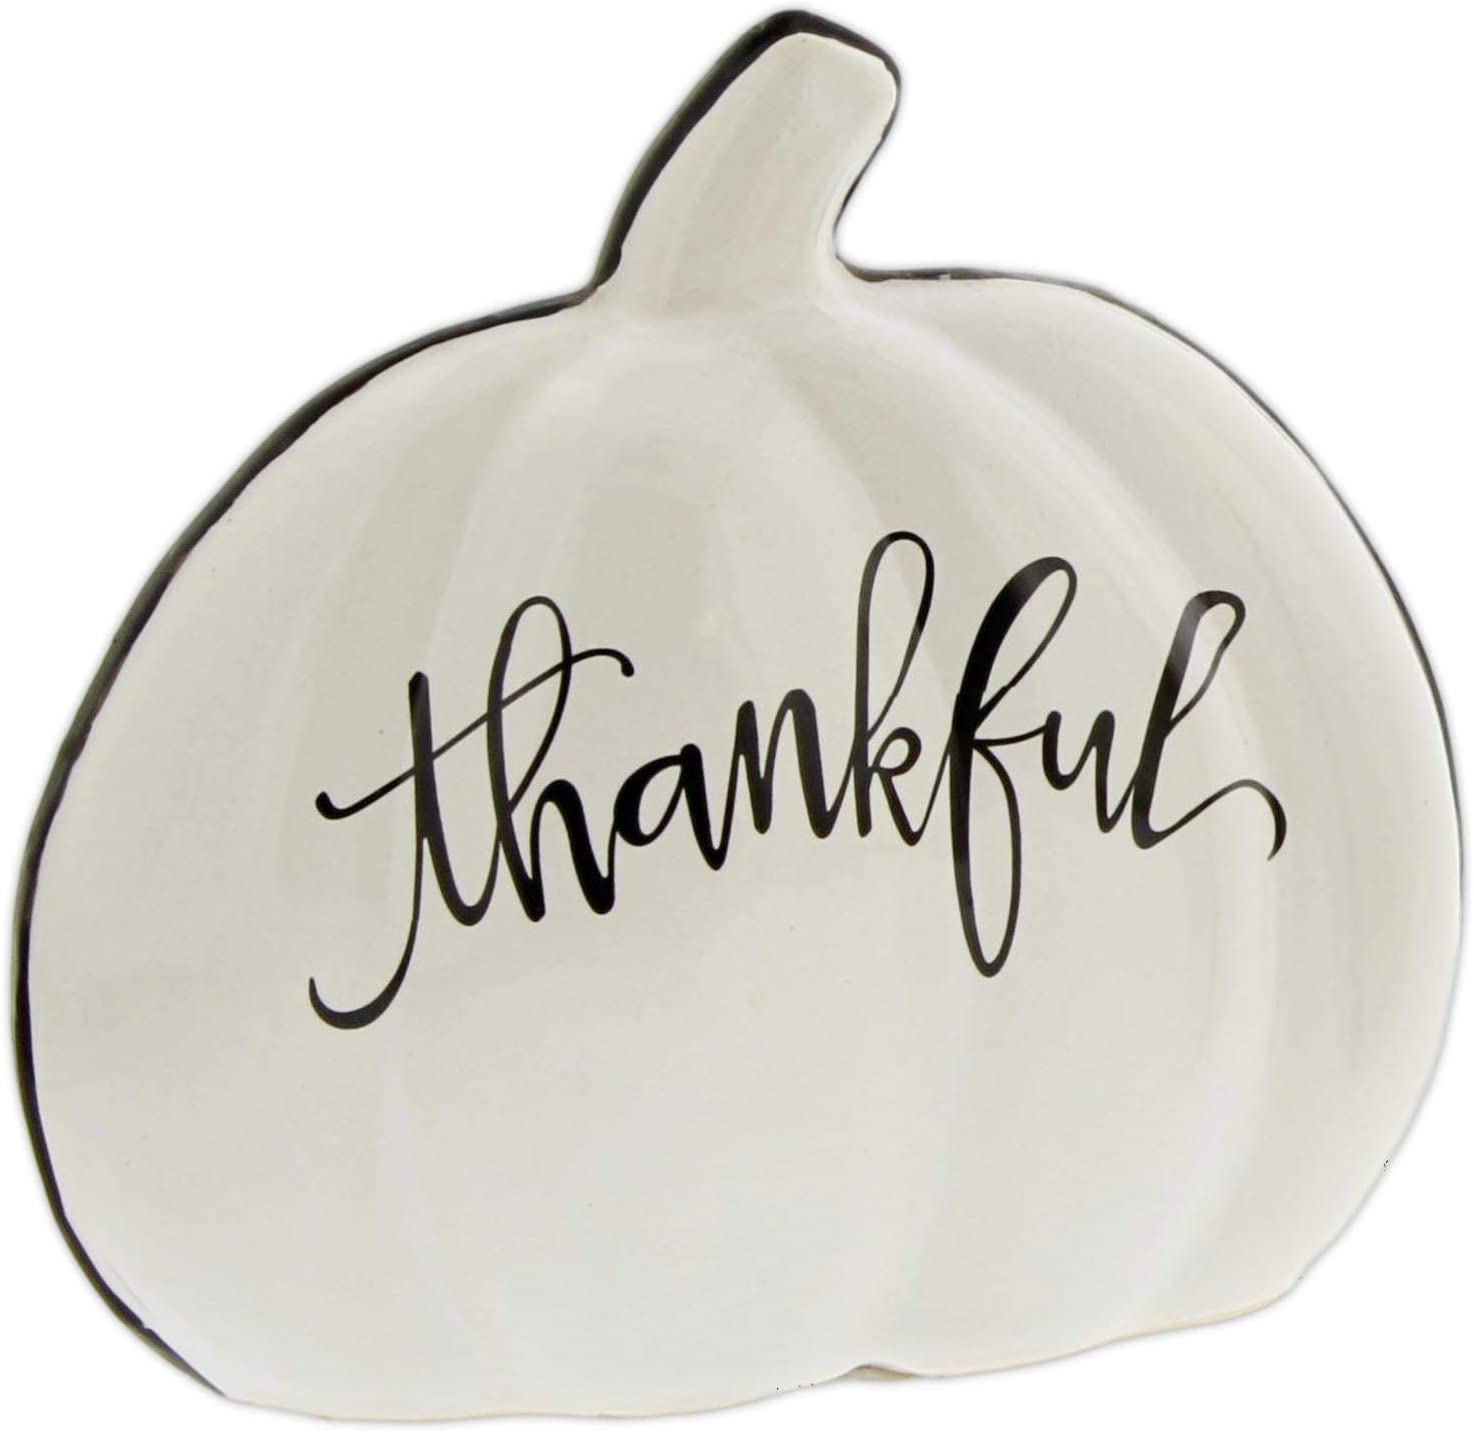 The Bridge Collection Black & White Ceramic Pumpkin Decor (Thankful)